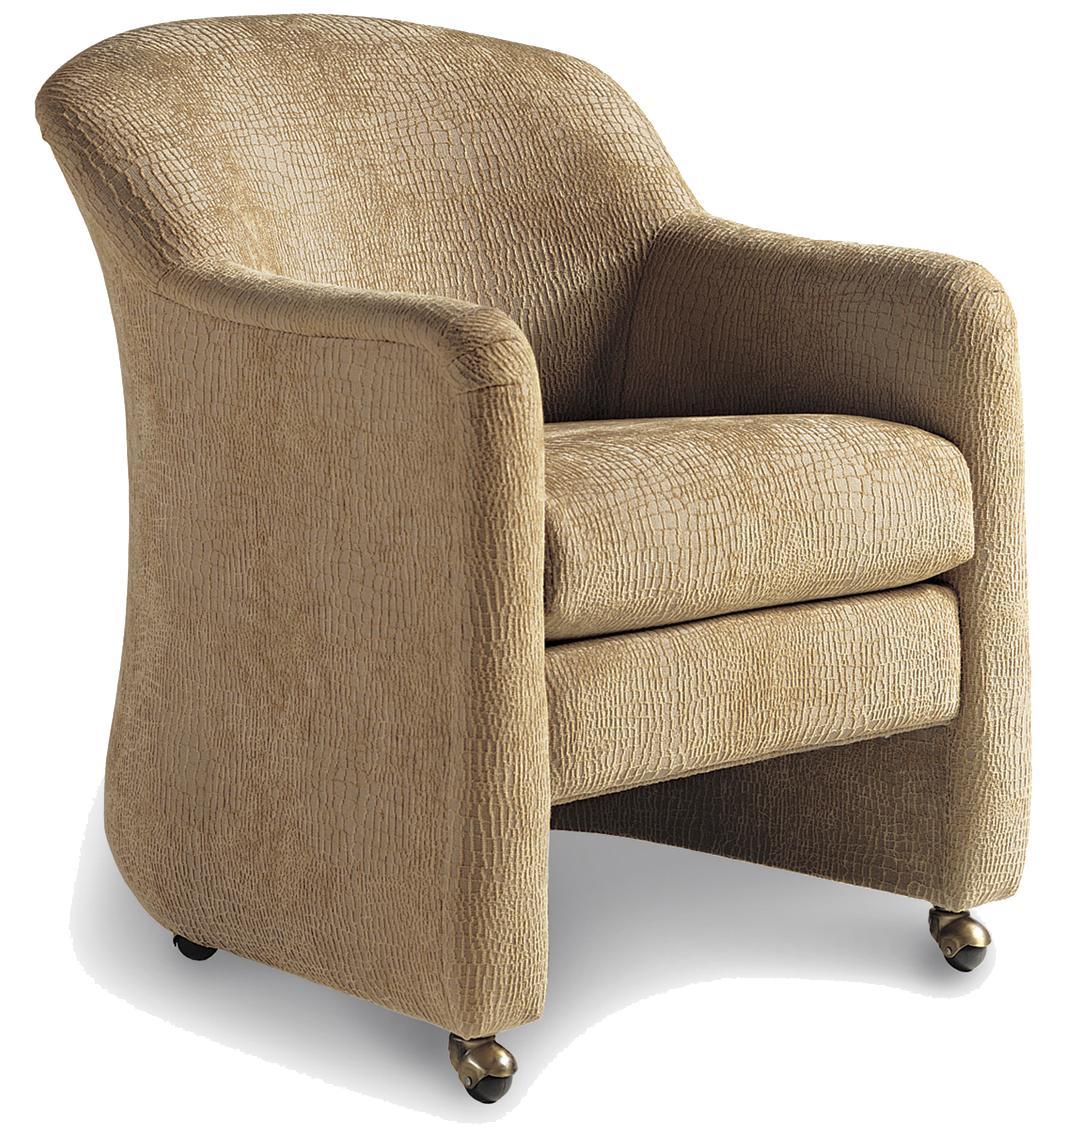 Stuckey Furniture